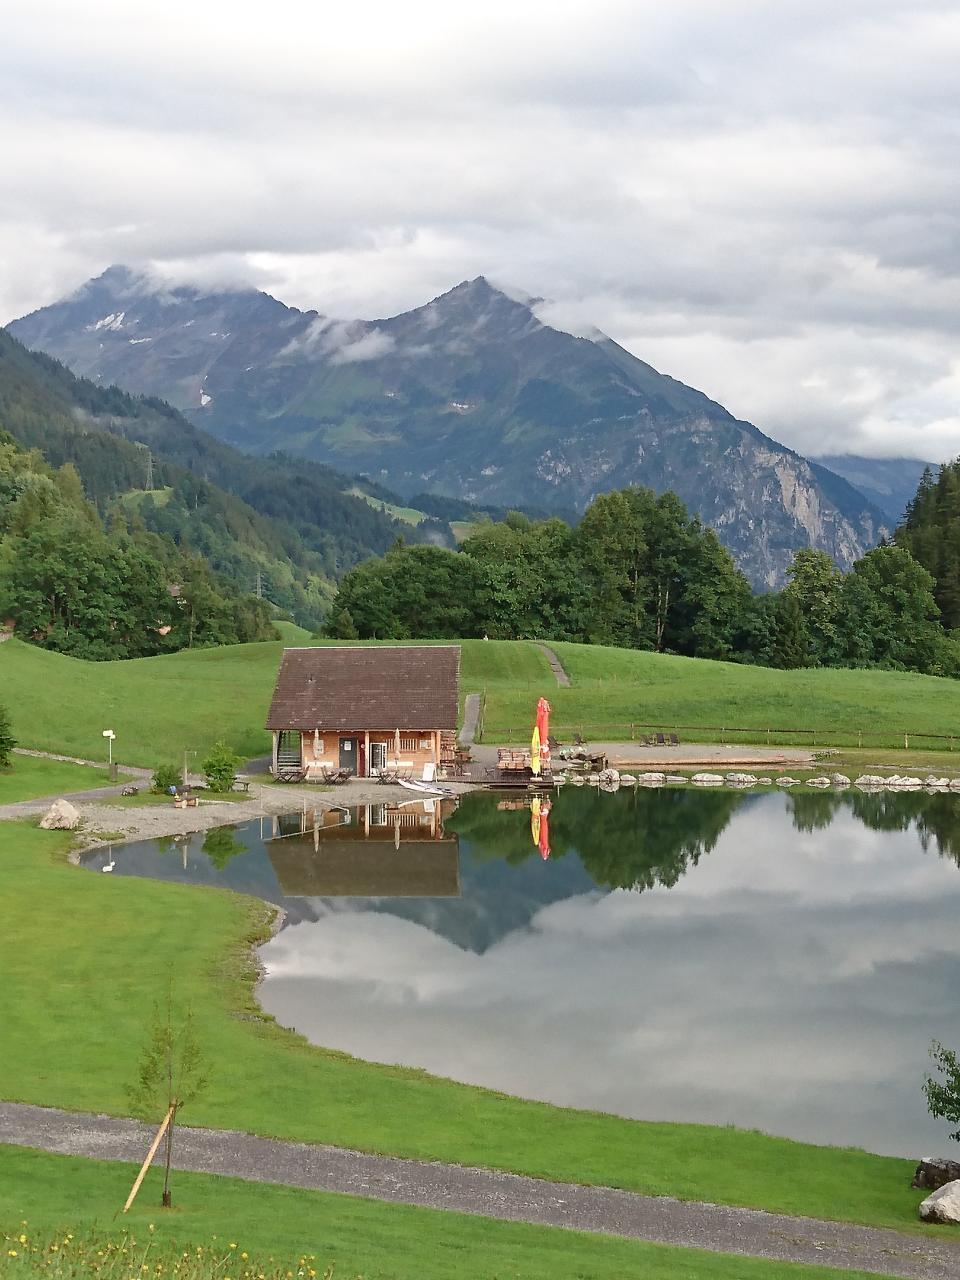 Ferienwohnung Obererli 4-Bettwohnung (2692316), Hasliberg Hohfluh, Meiringen - Hasliberg, Berner Oberland, Schweiz, Bild 21